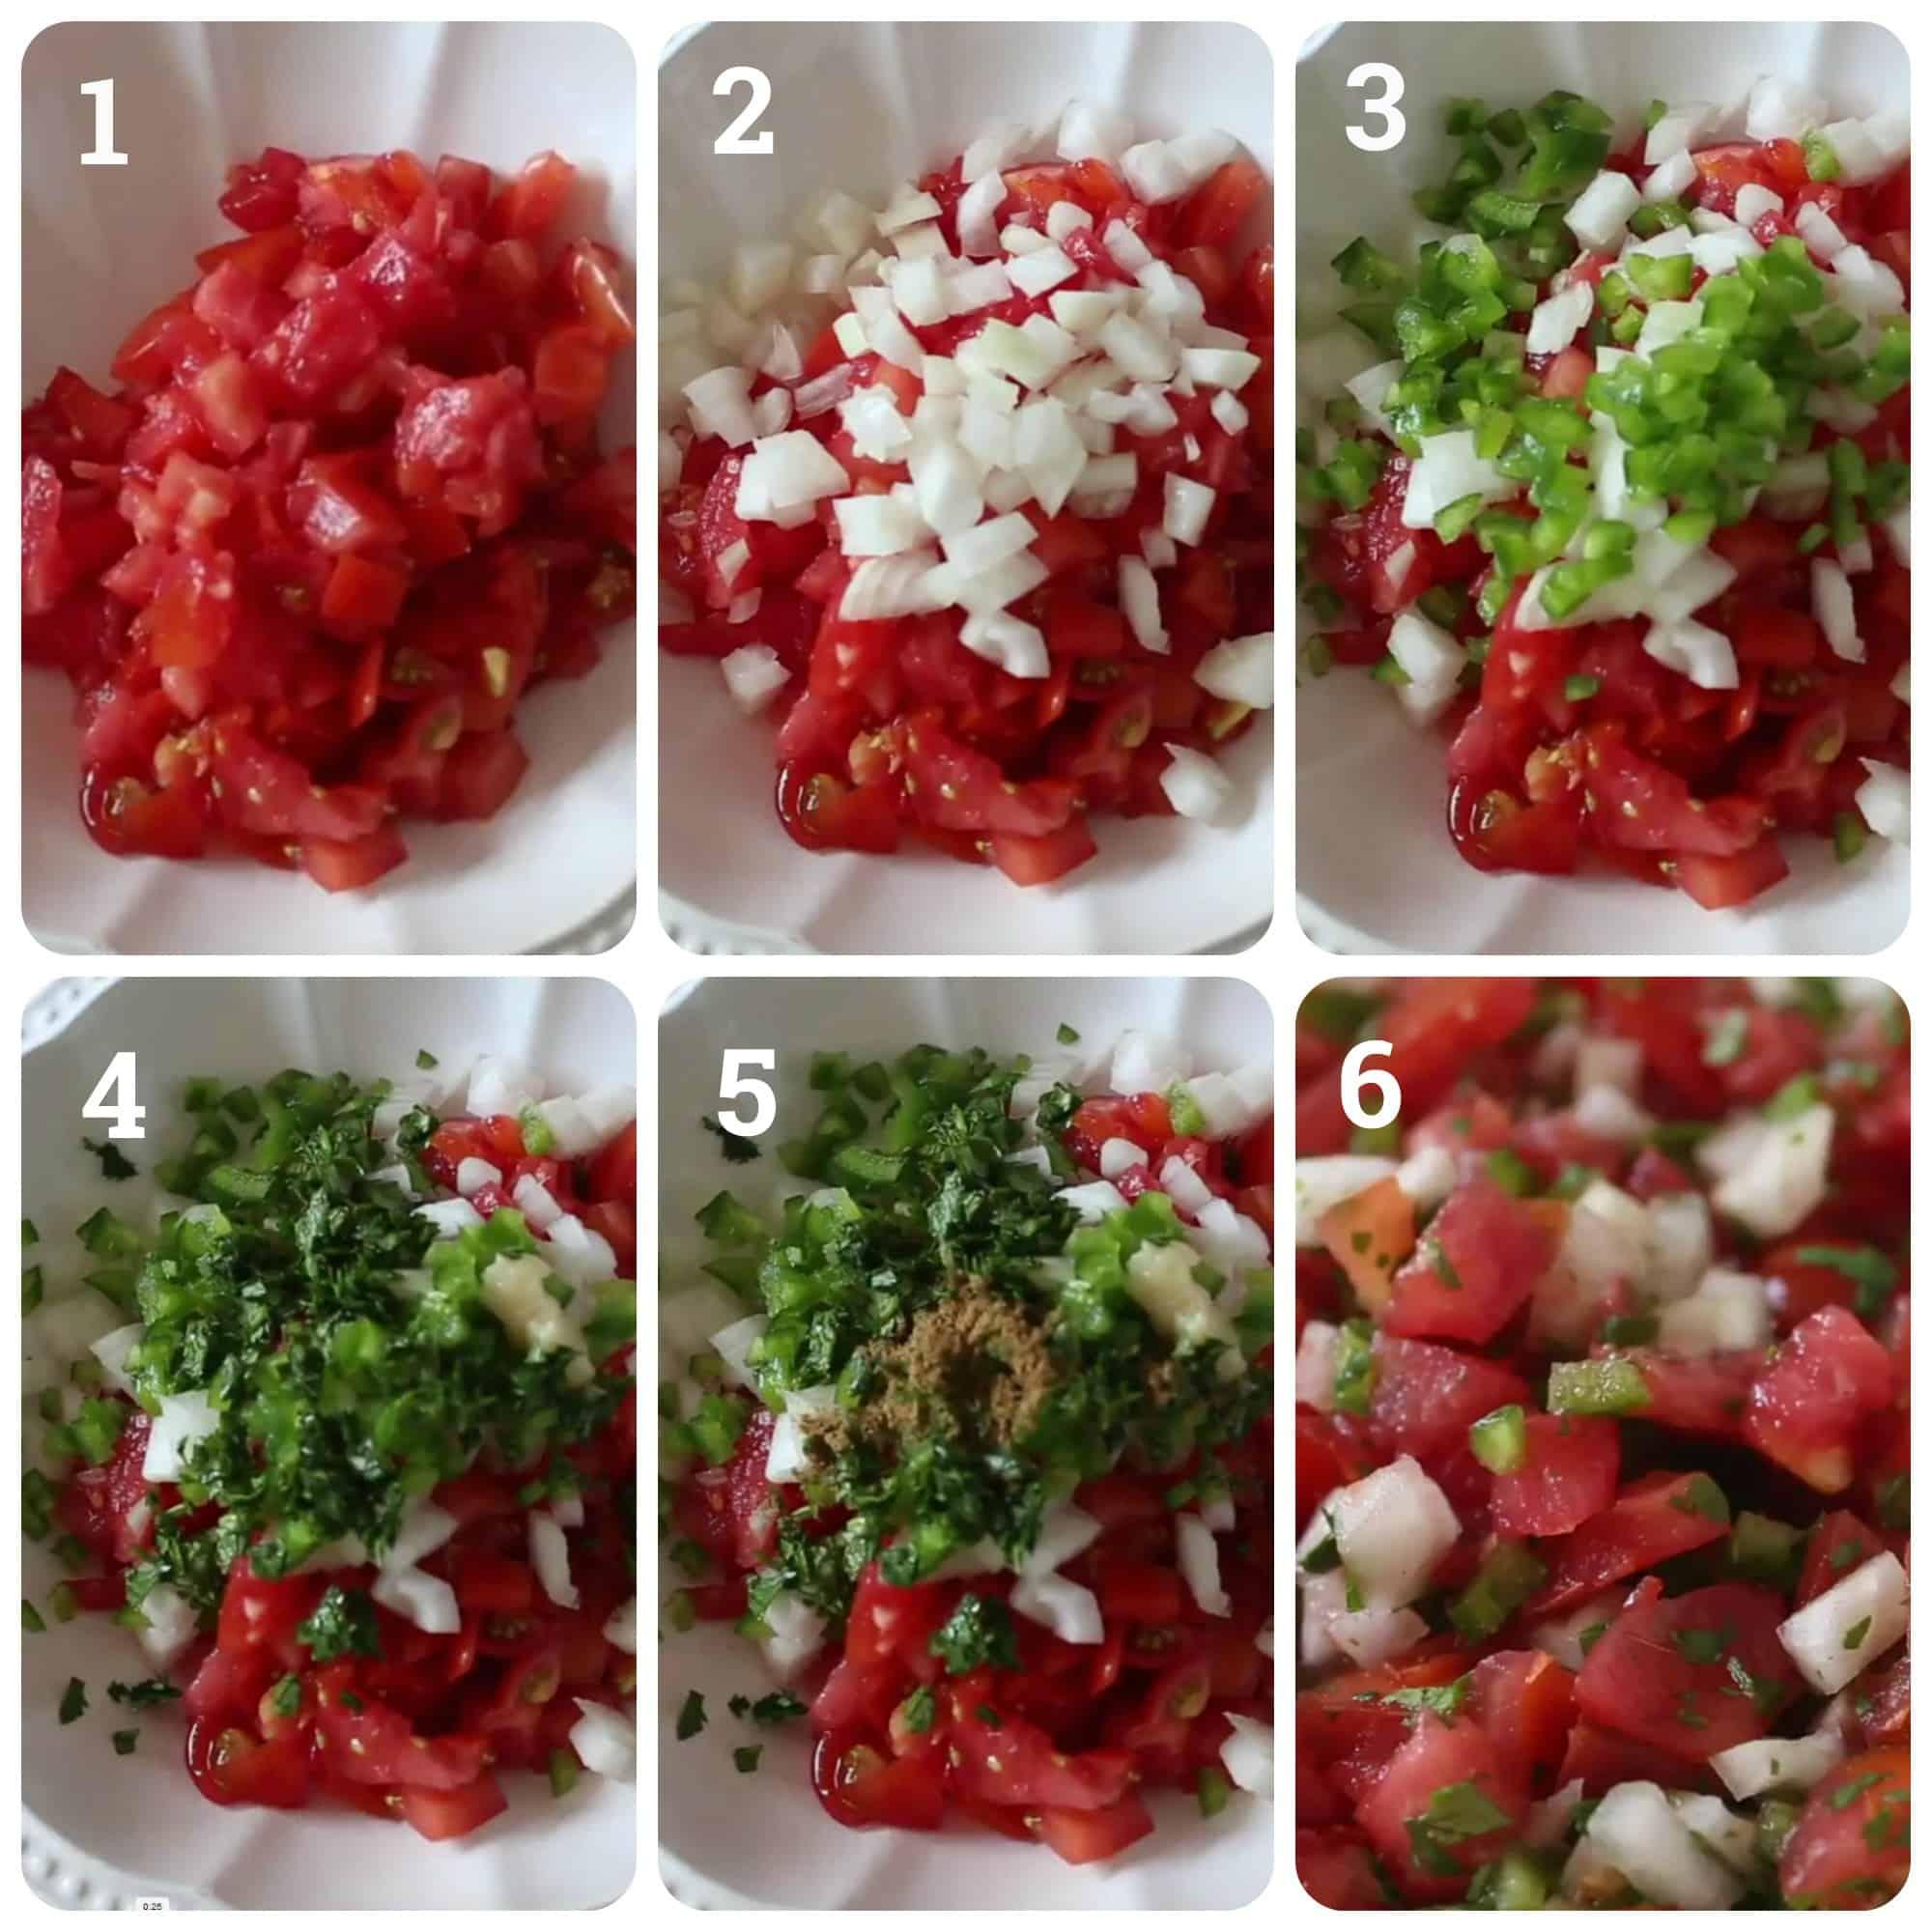 Step by step photos of making pico de gallo salsa